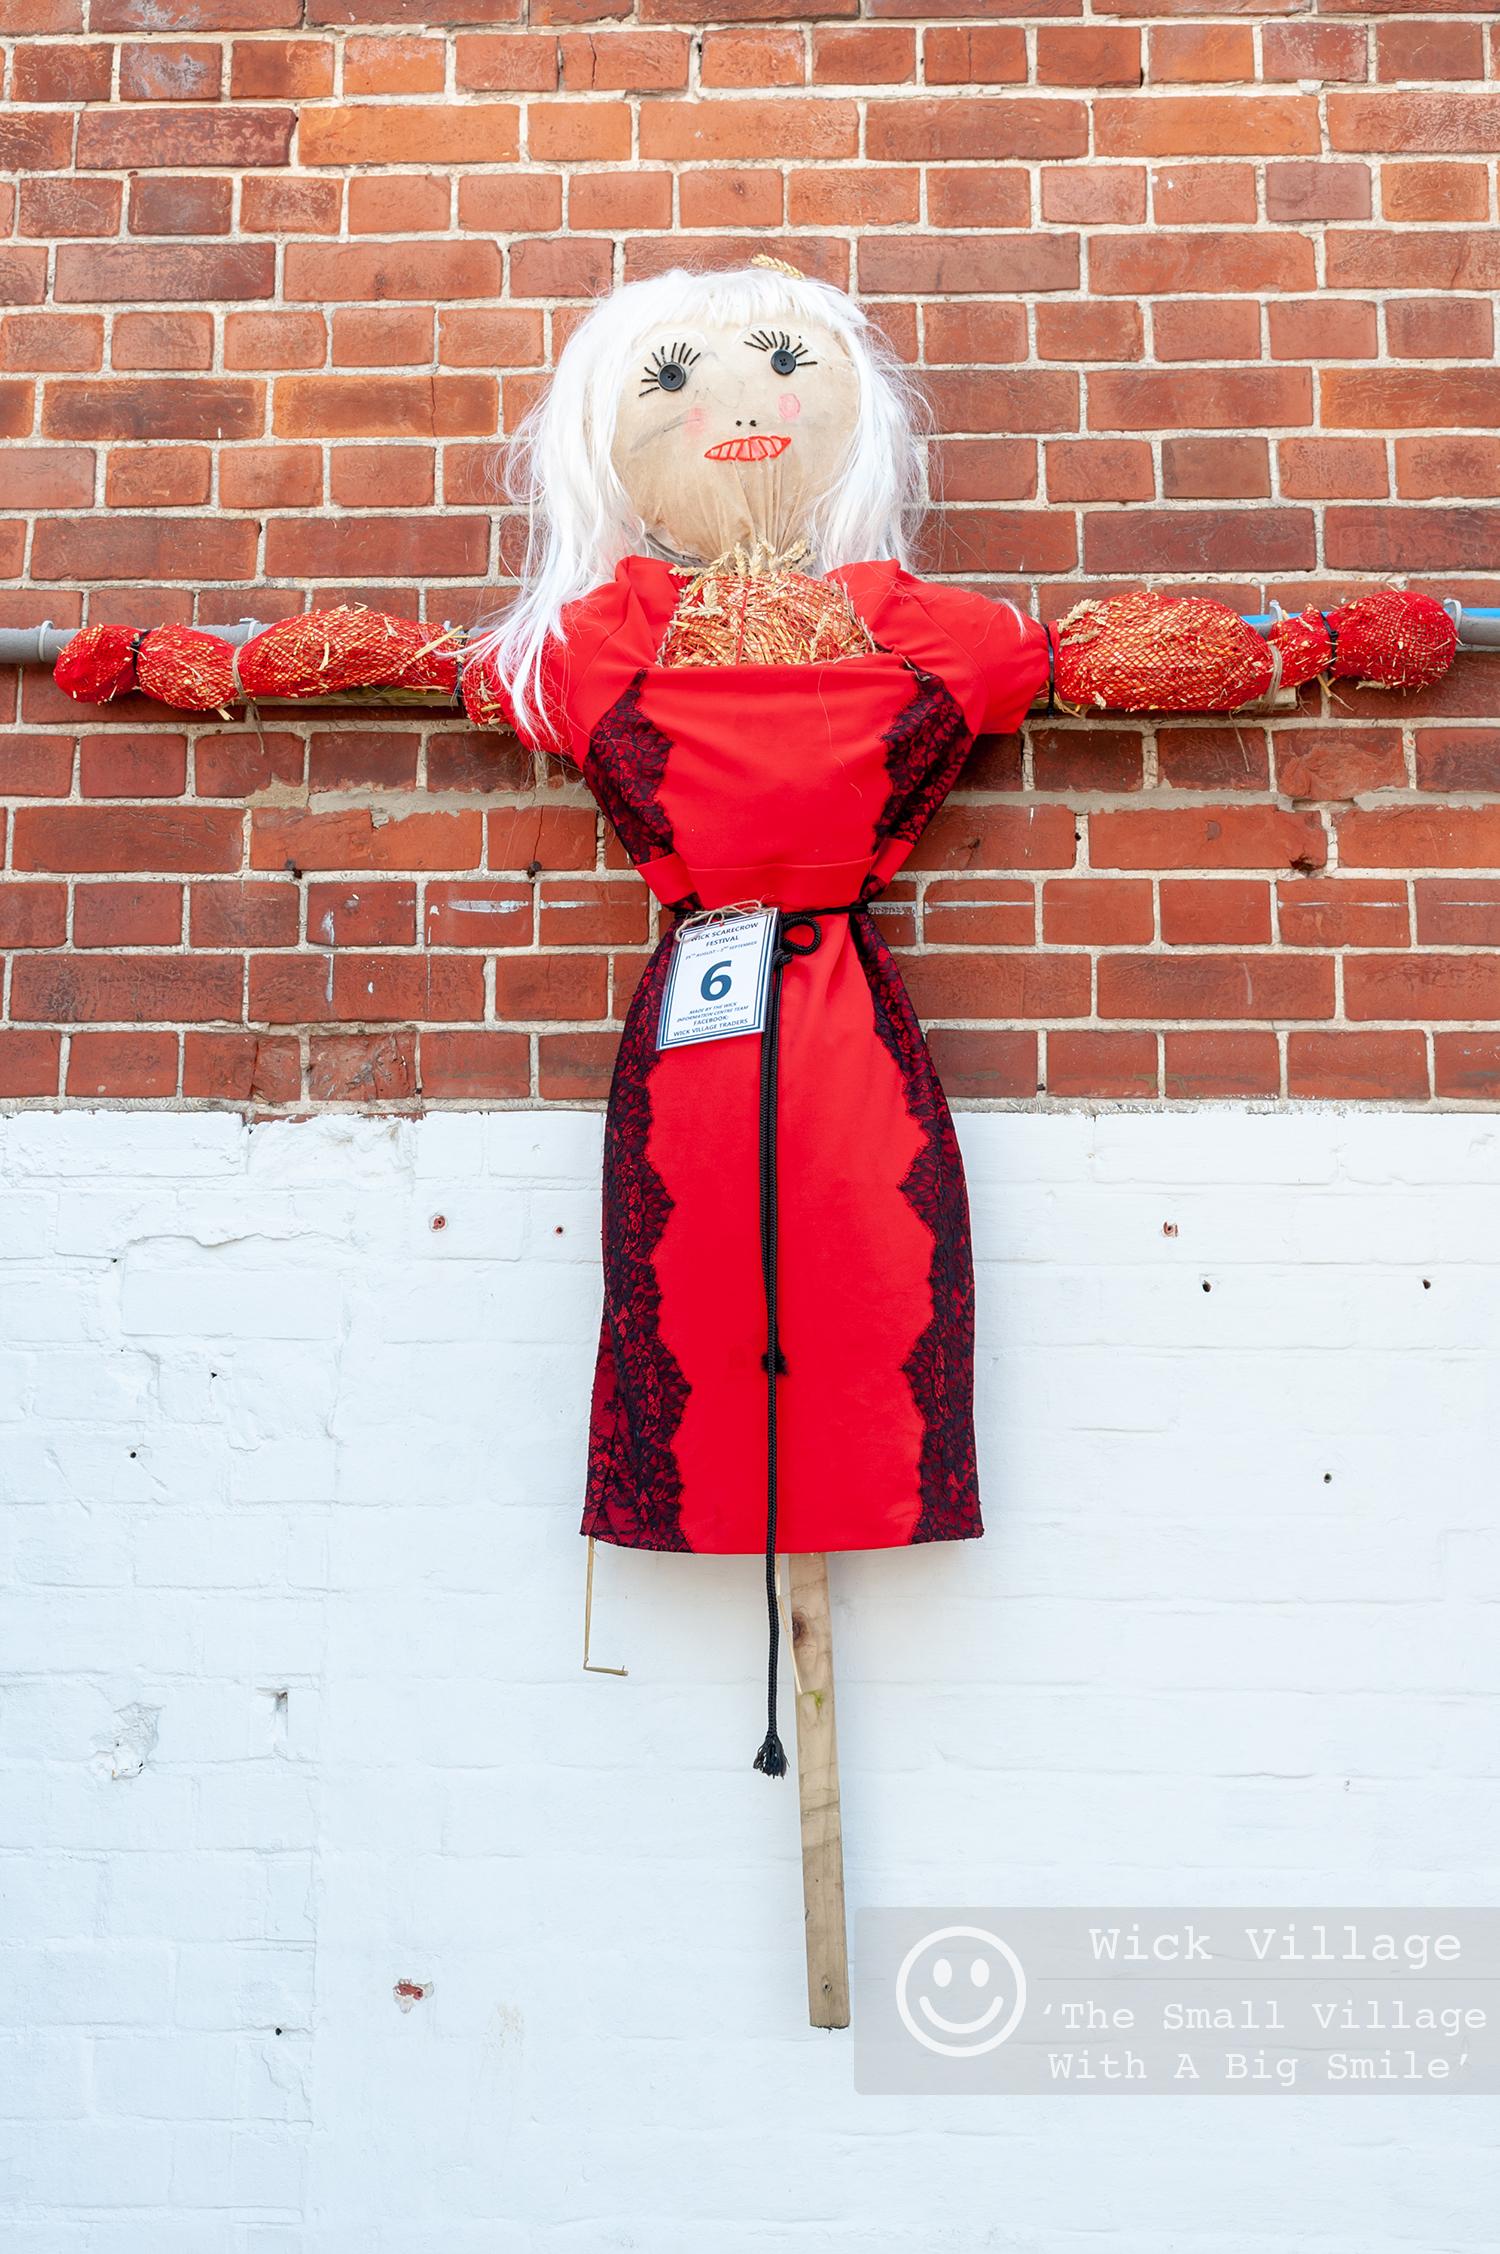 Wick Village Scarecrow Festival